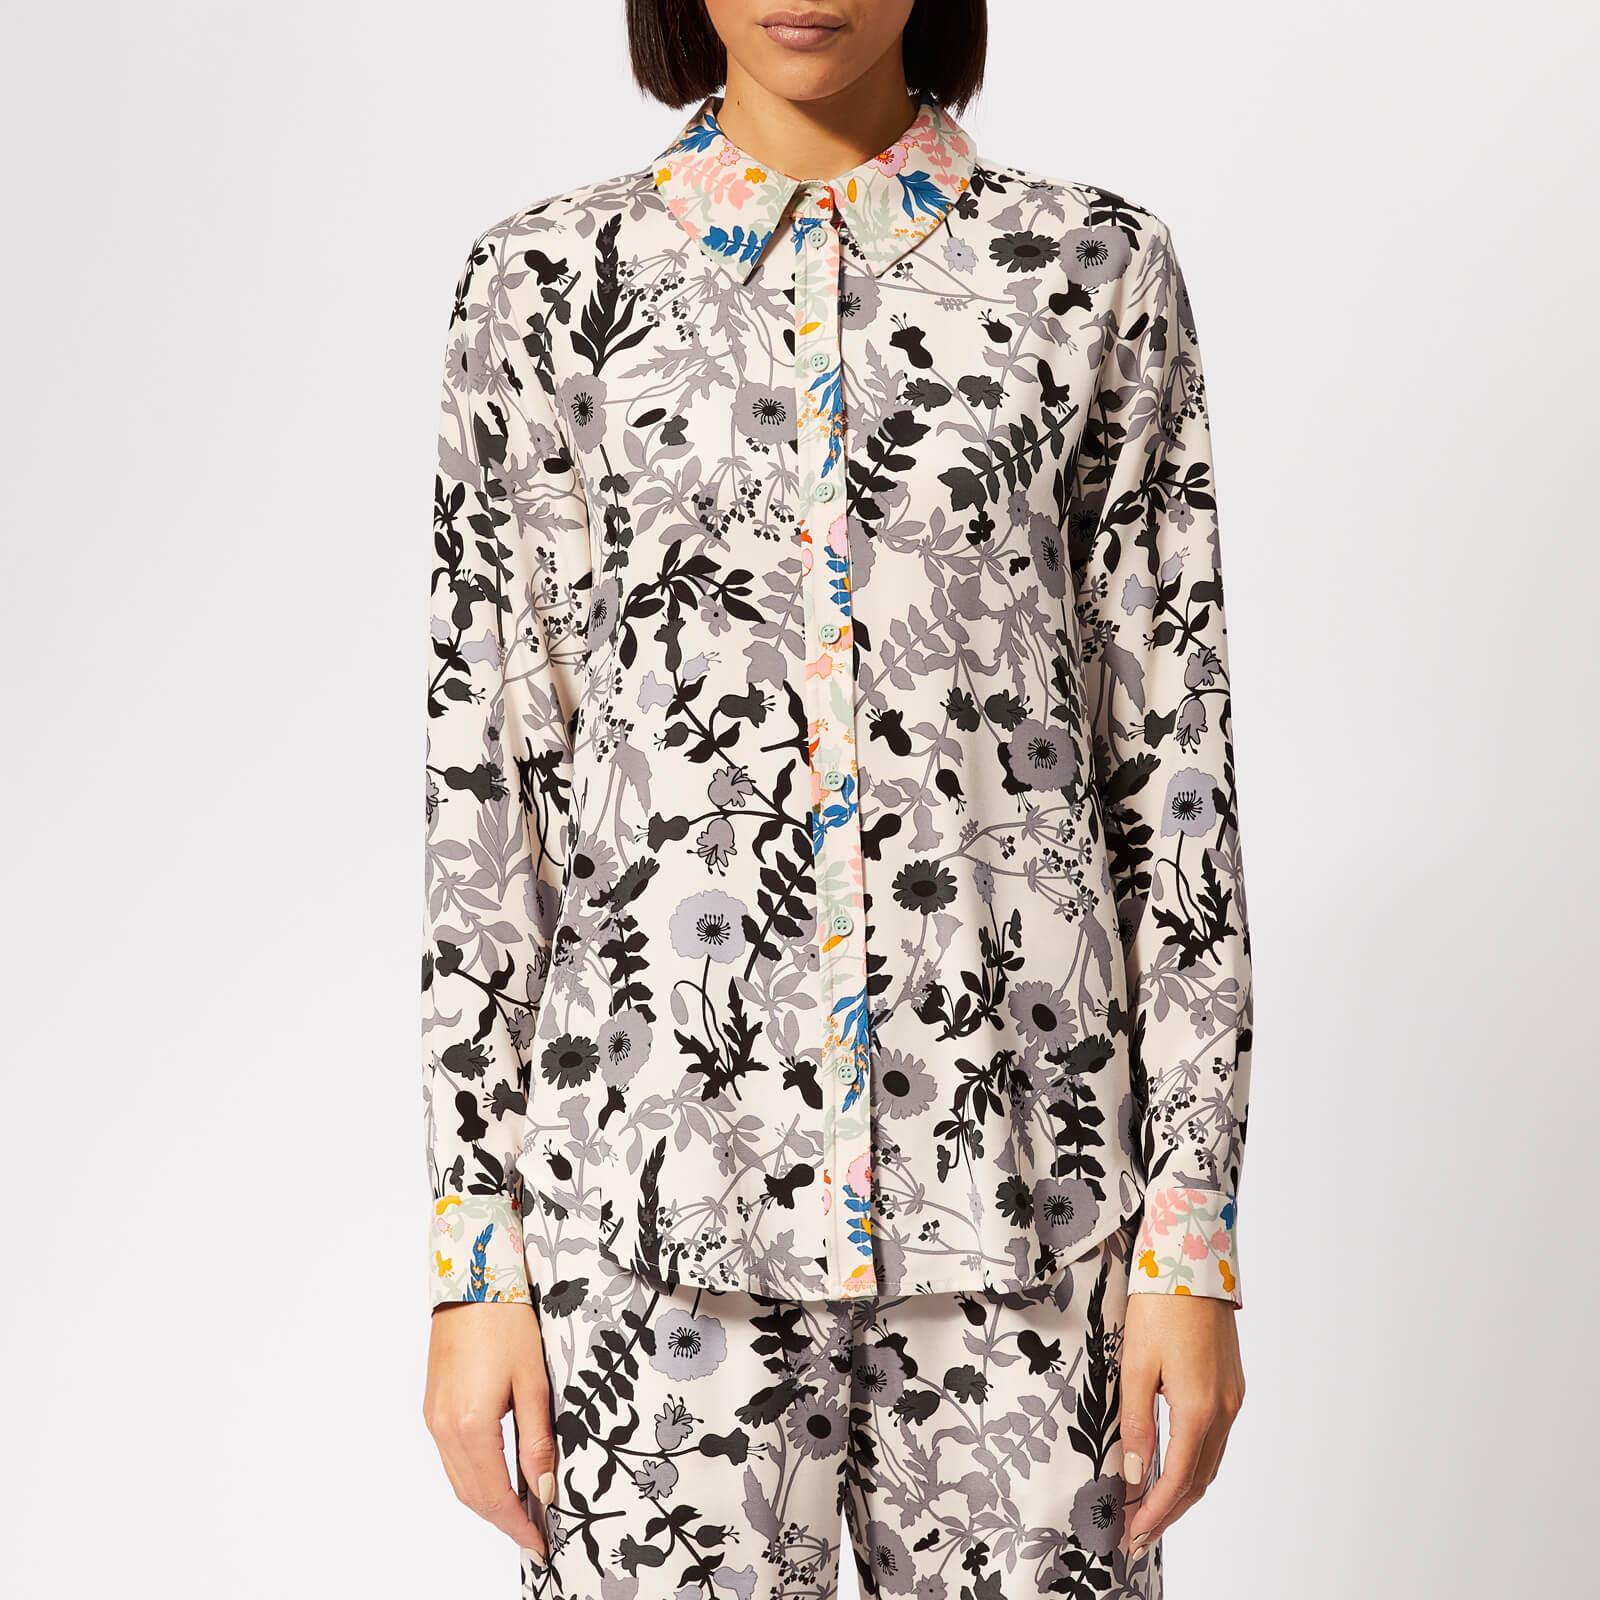 bca925381b4 Stine Goya Women's Maxwell Shirt - Flowers Light - Free UK Delivery over £50